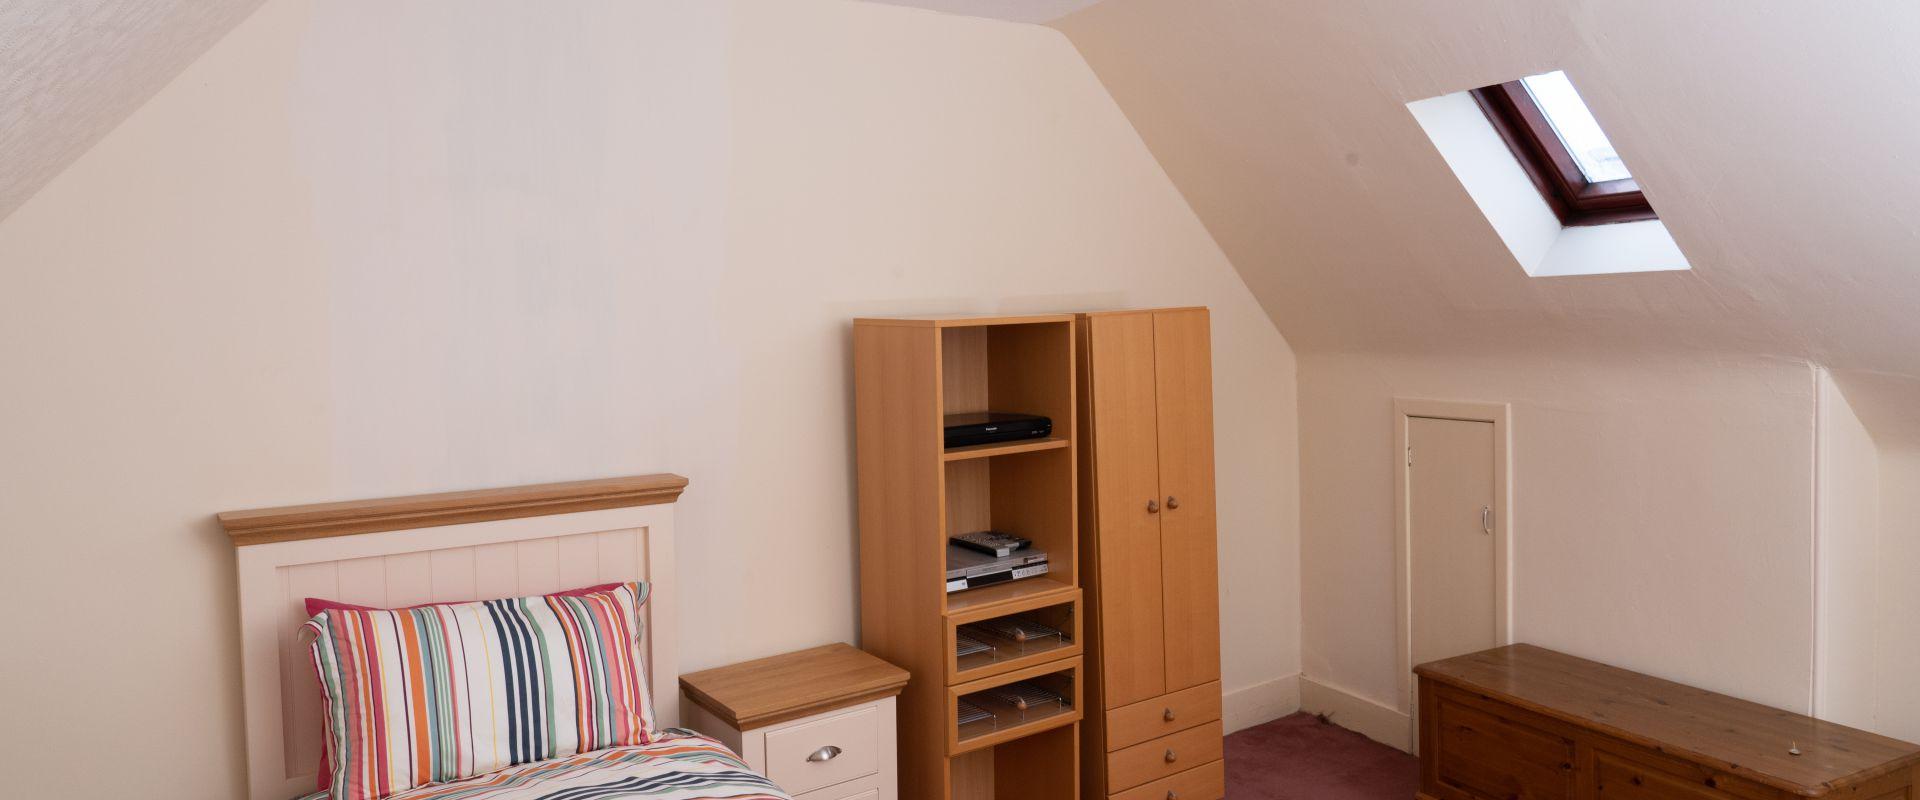 ARD-Properties-Development-Sites-Buy-Homes-Rent-Aberdeenshire-Rentals-2a-St-Andrew-Streeet-Peterhead-Banner (22)